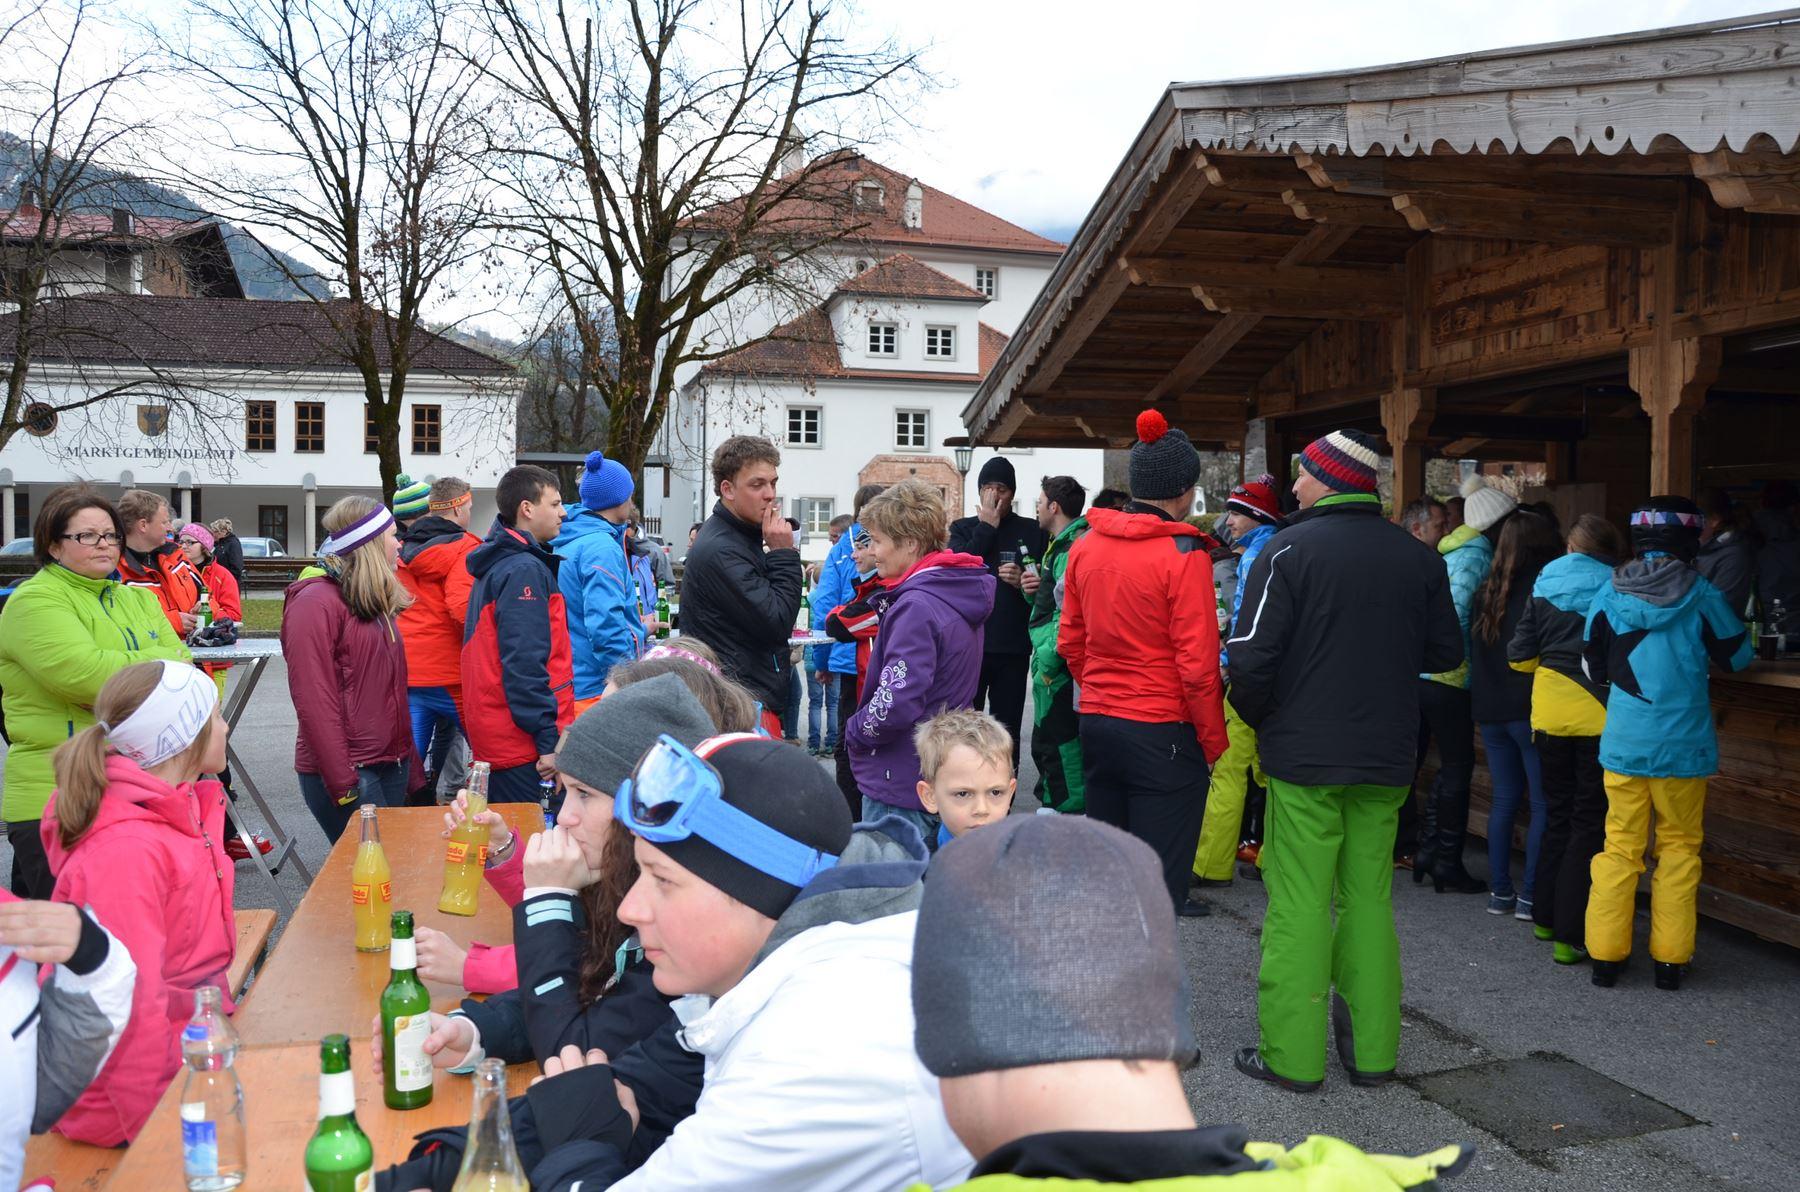 2015-03-22 BV Zillertal Skirennen 339.JPG